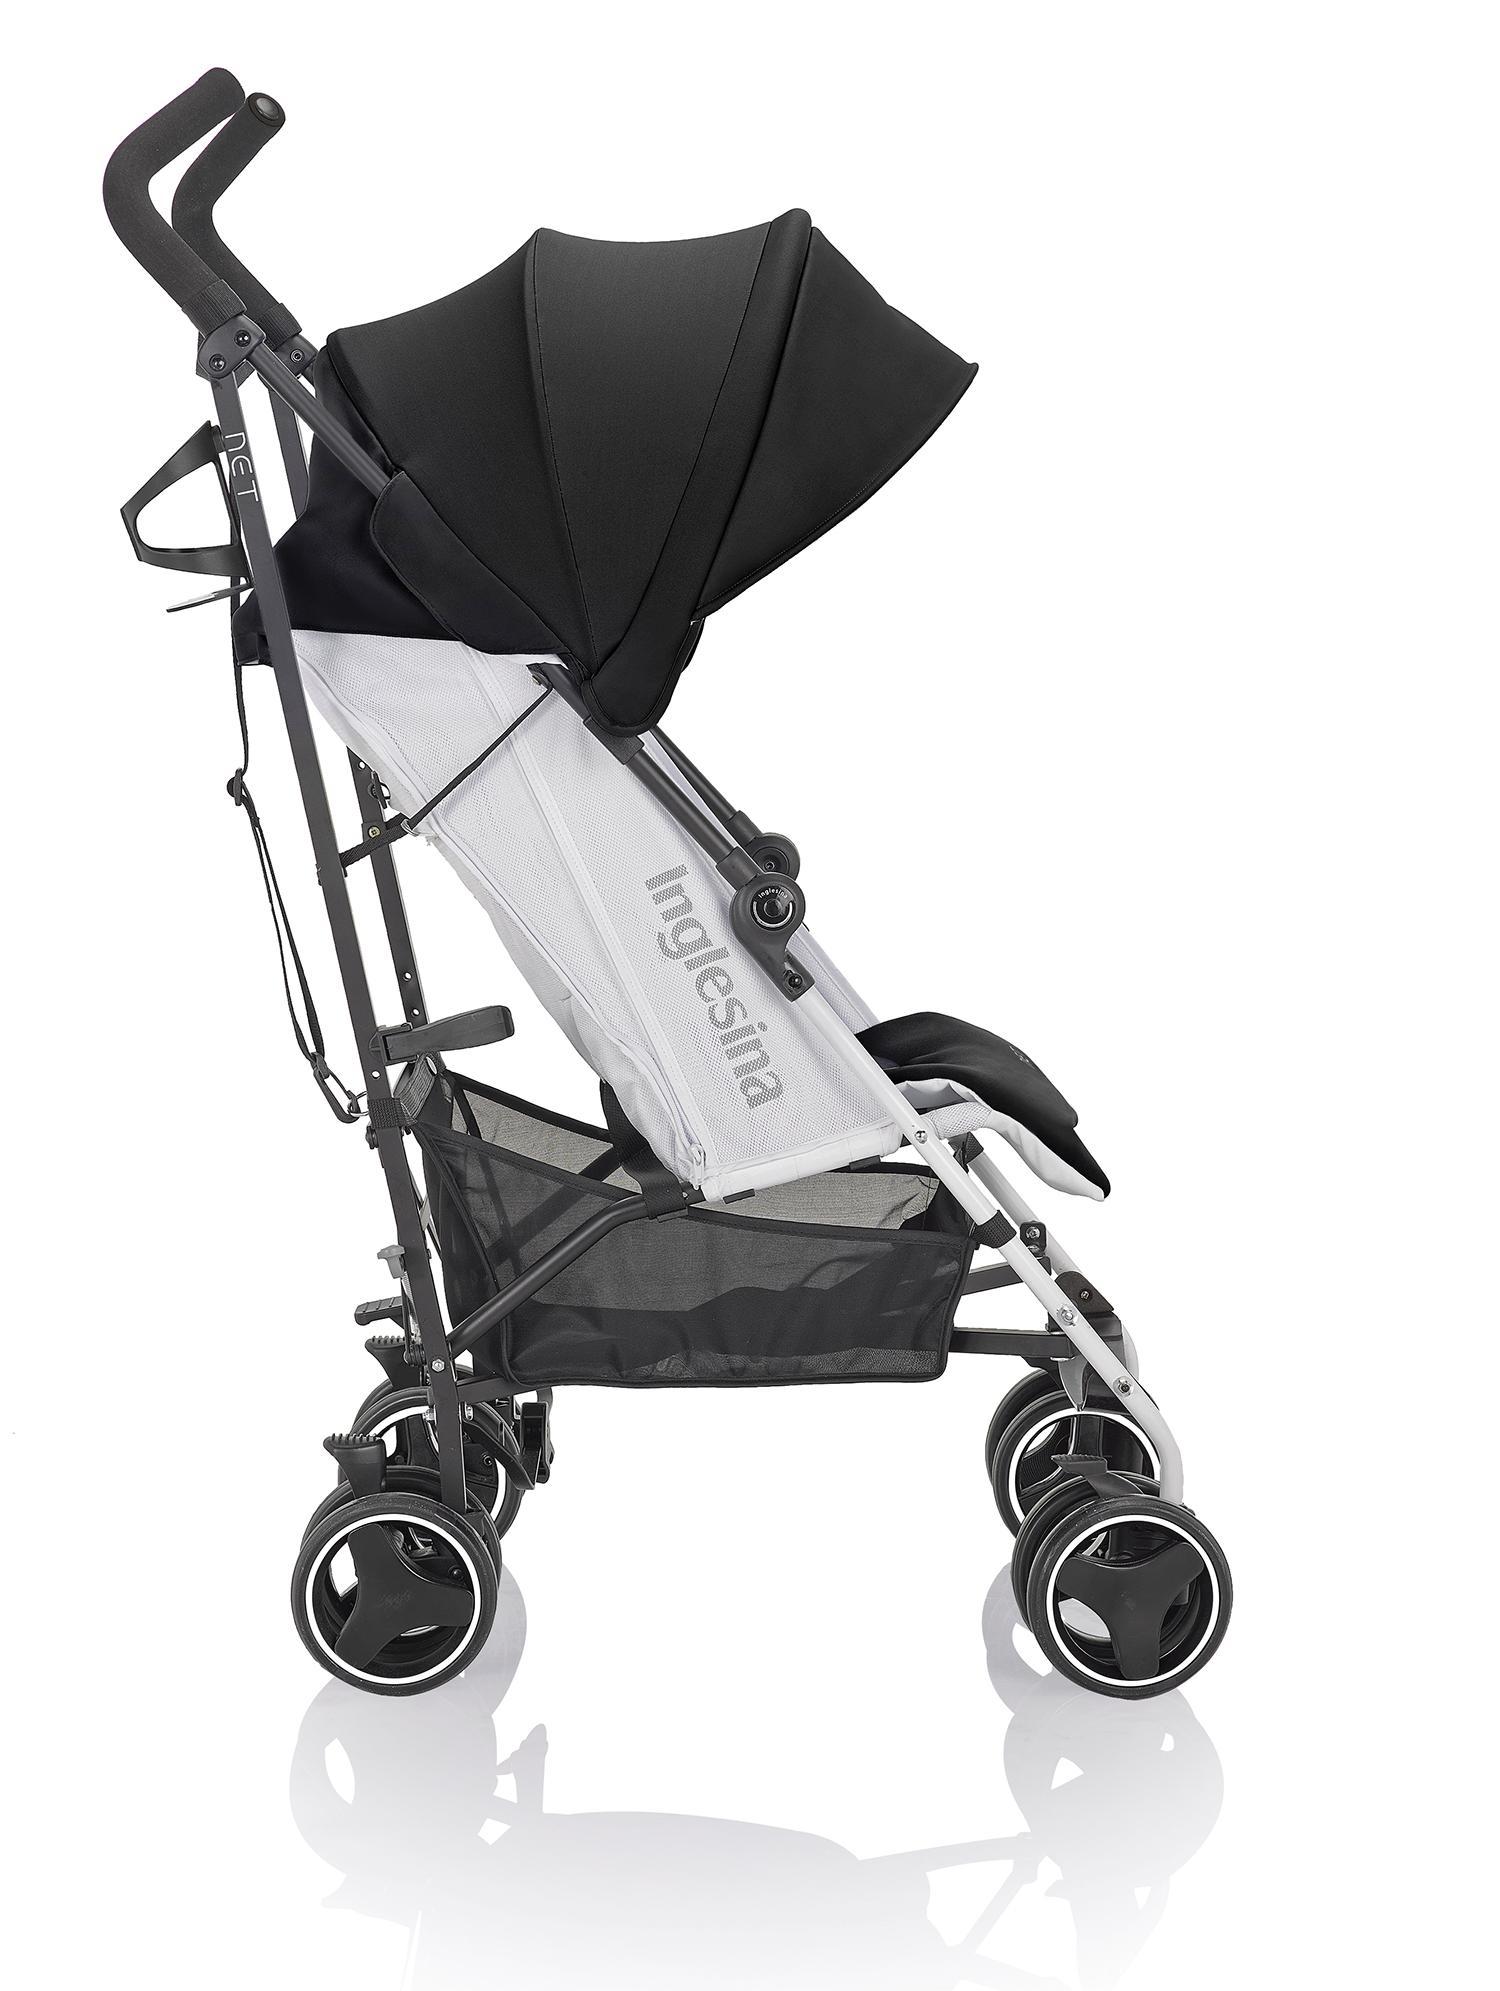 Amazon.com : Inglesina Net Stroller, Paprika : Baby